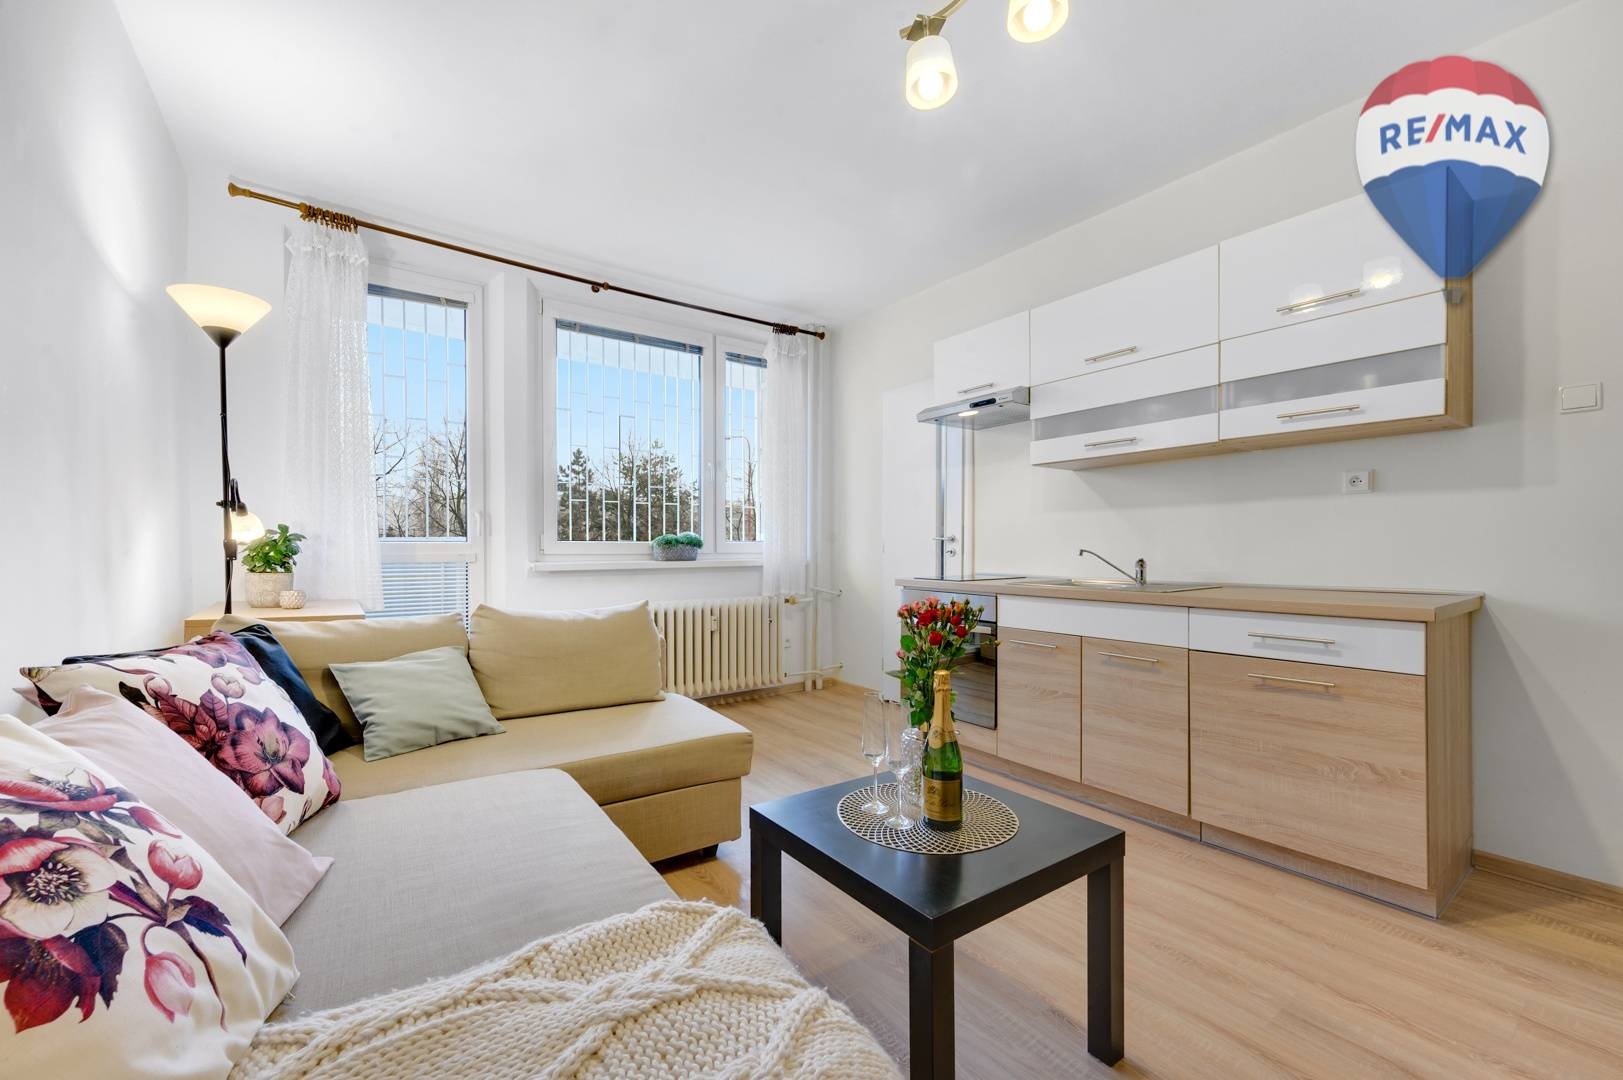 1 izbový byt dispozične upravený na 1,5 izbový na Karloveskej ulici